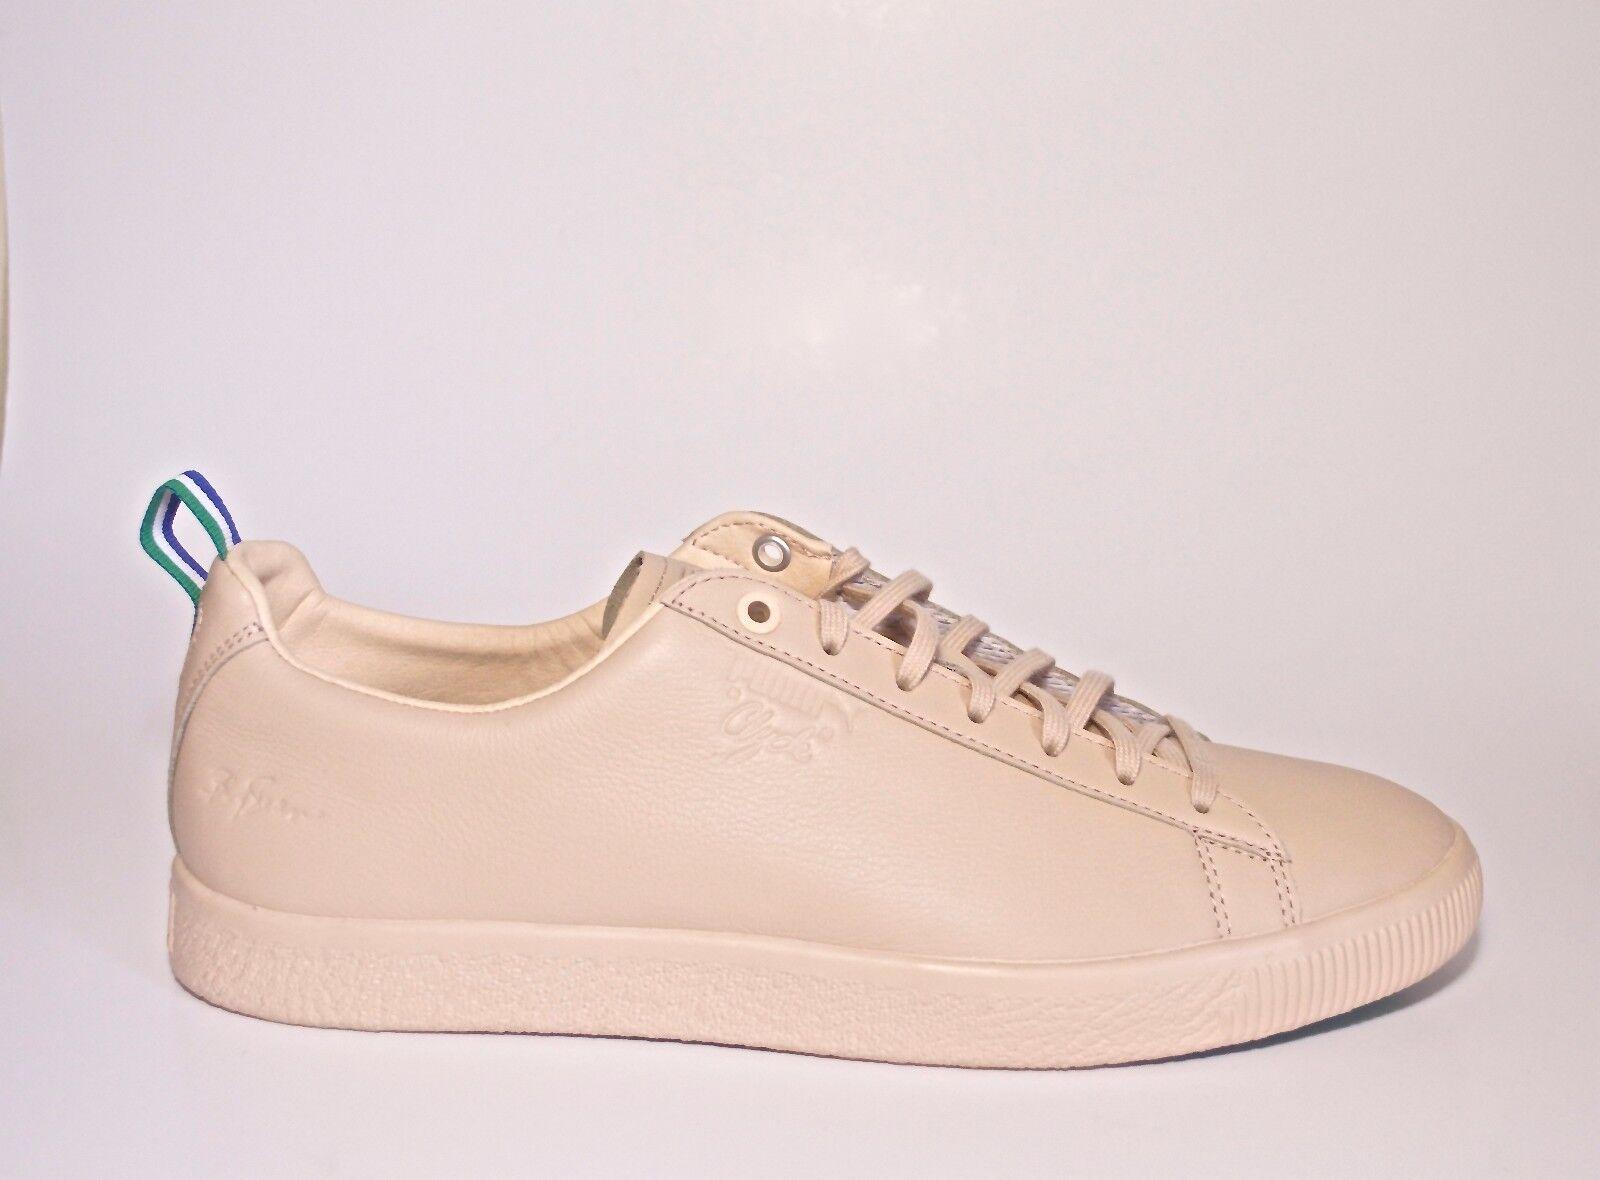 low priced 6618a dbb37 Puma CLYDE Big Sean Natural Vachetta Men's shoes Size Size ...